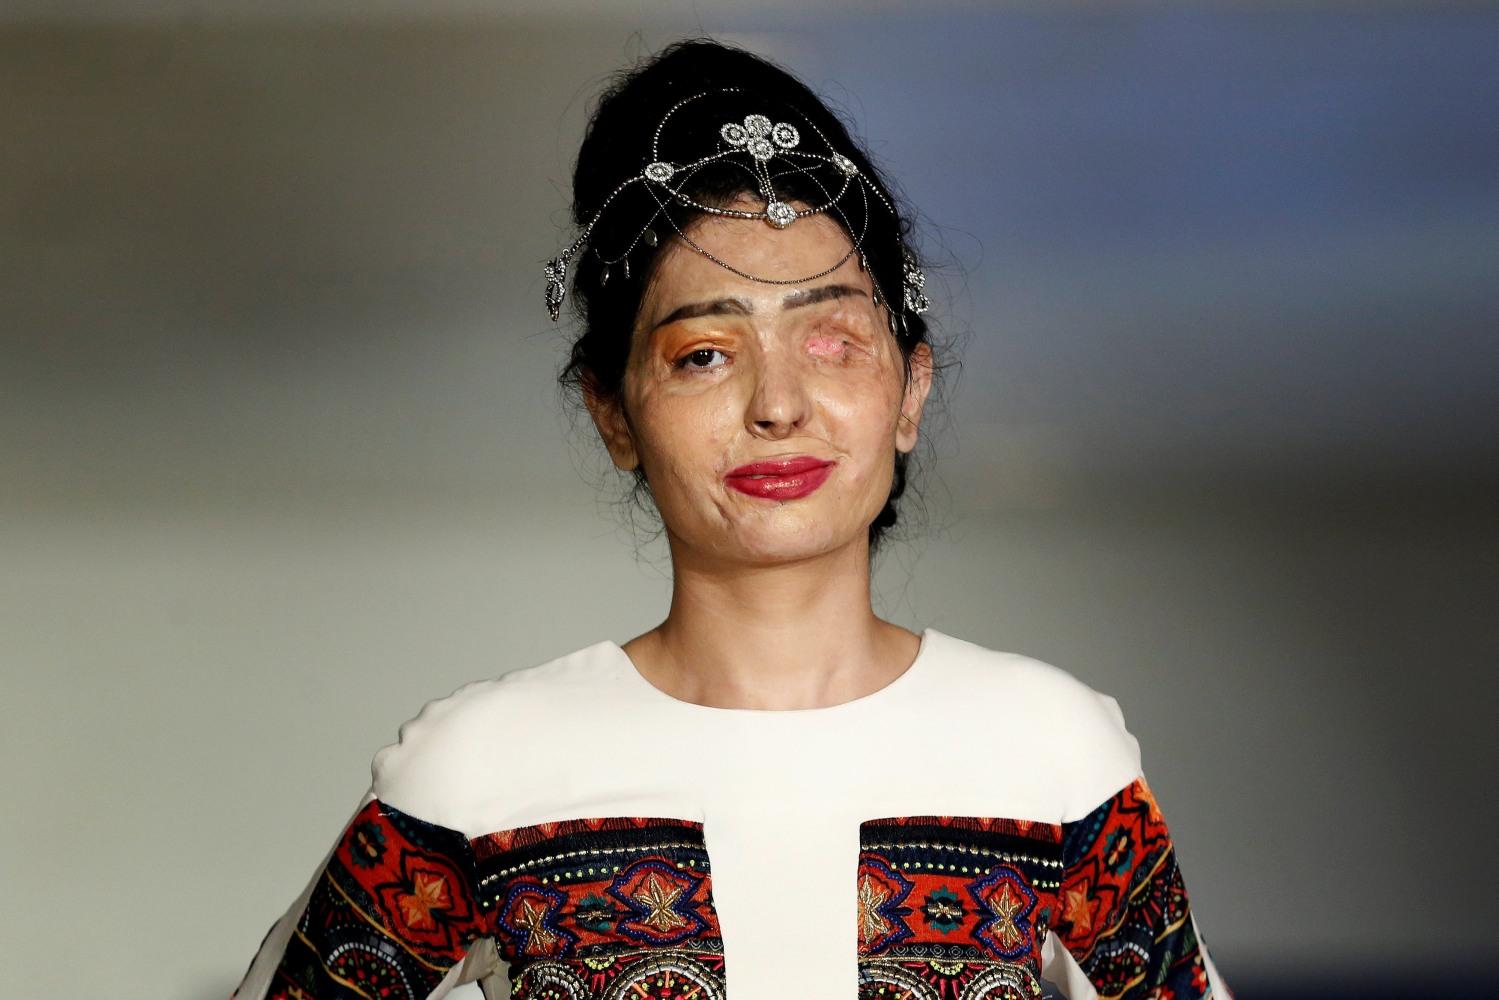 india acid attack survivor walks runway at ny fashion